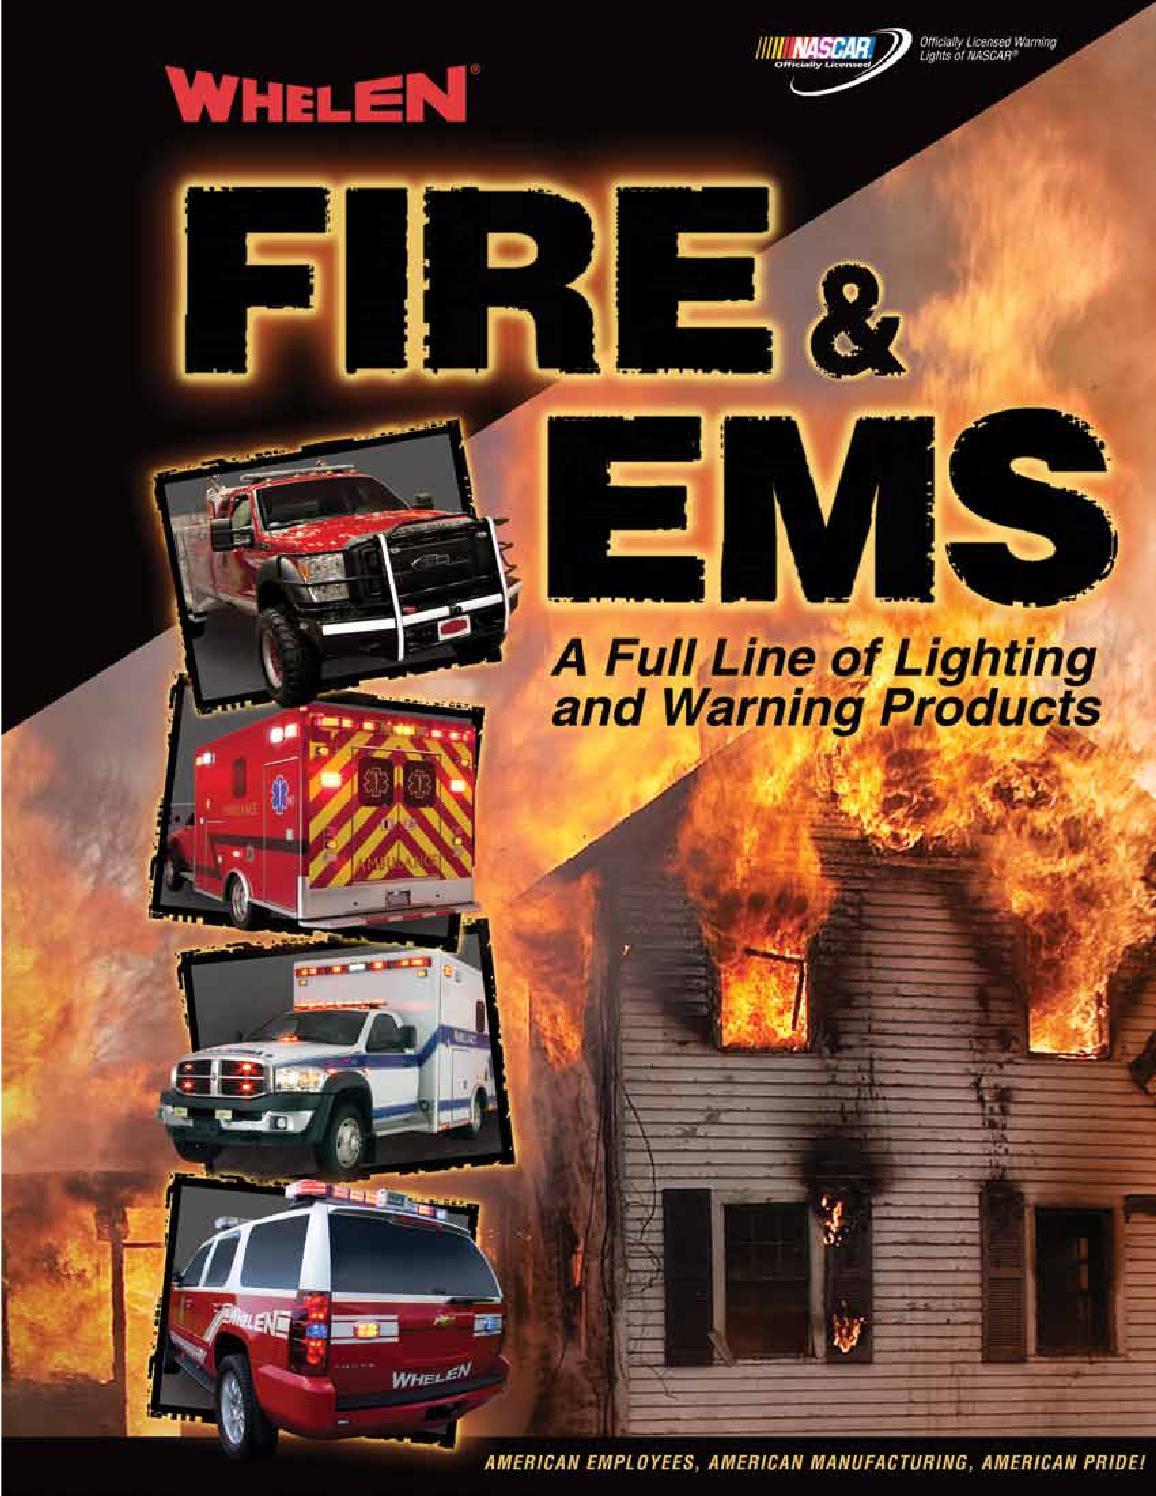 Fire Ems Catalog By Smiles Issuu Change Whelen Siren Tones